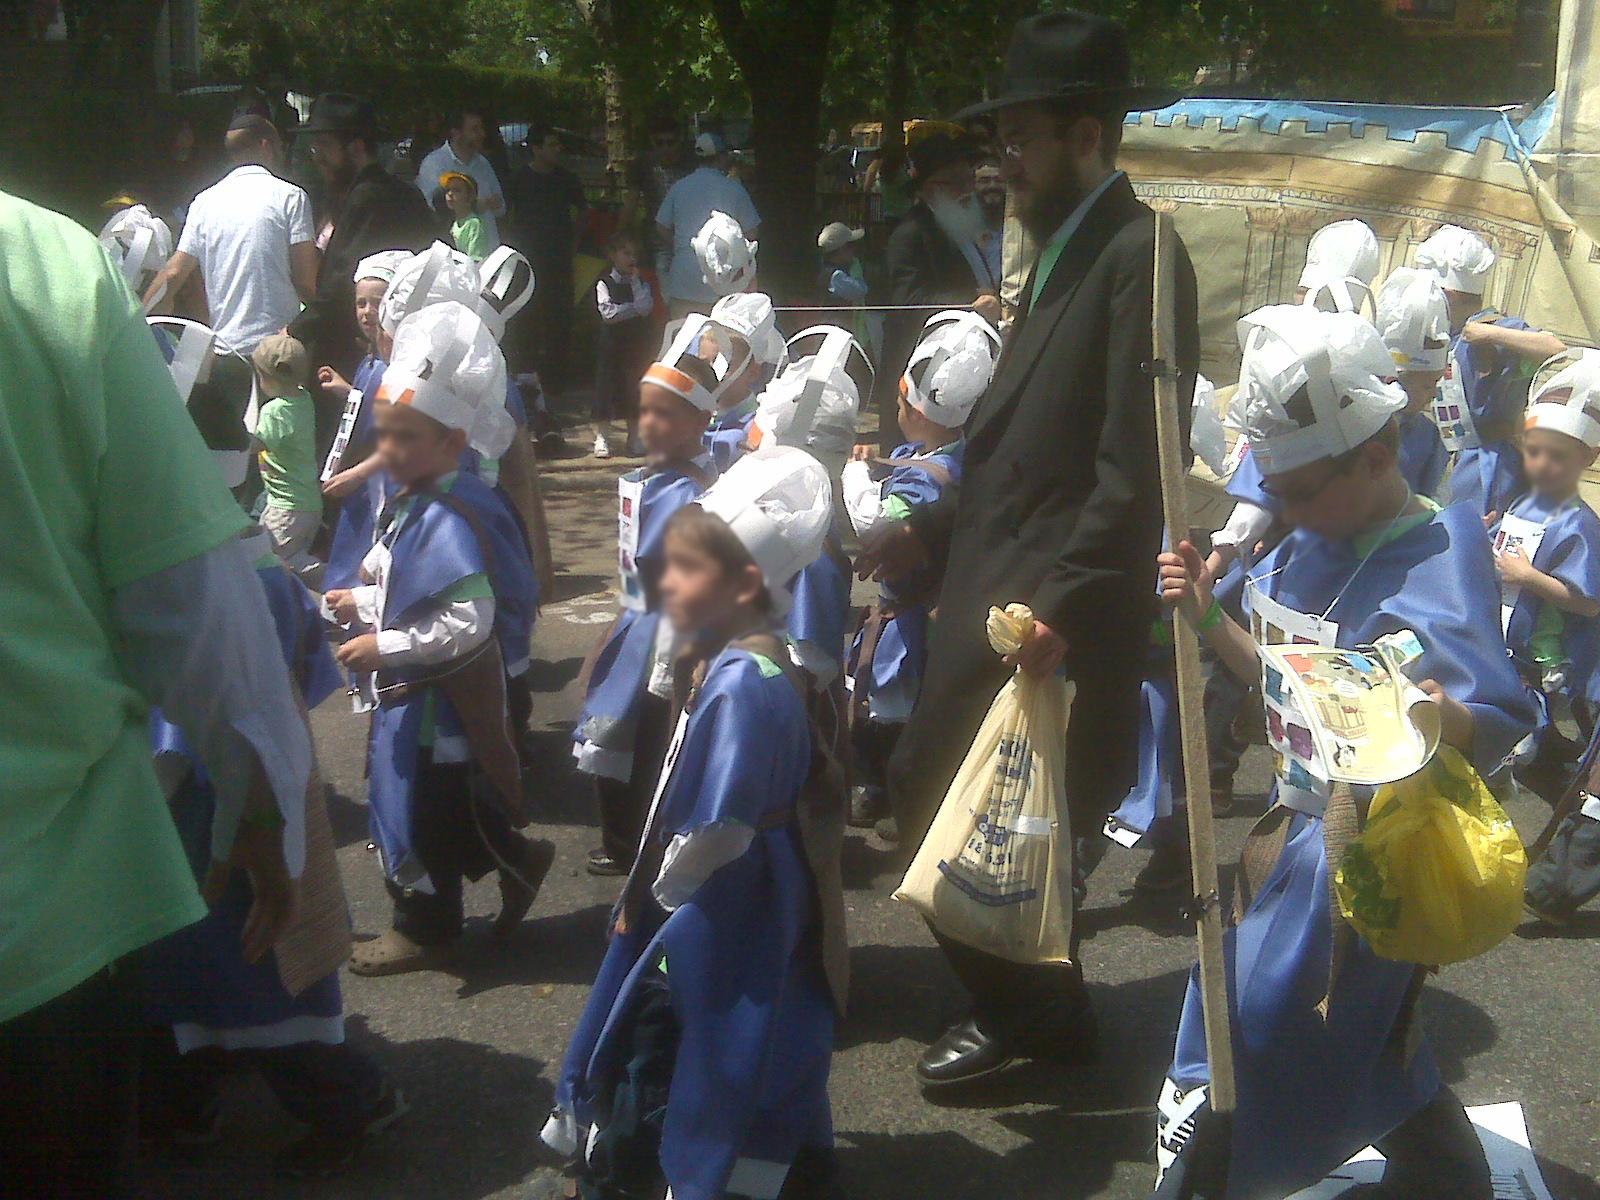 2013-04-23-parade.jpg